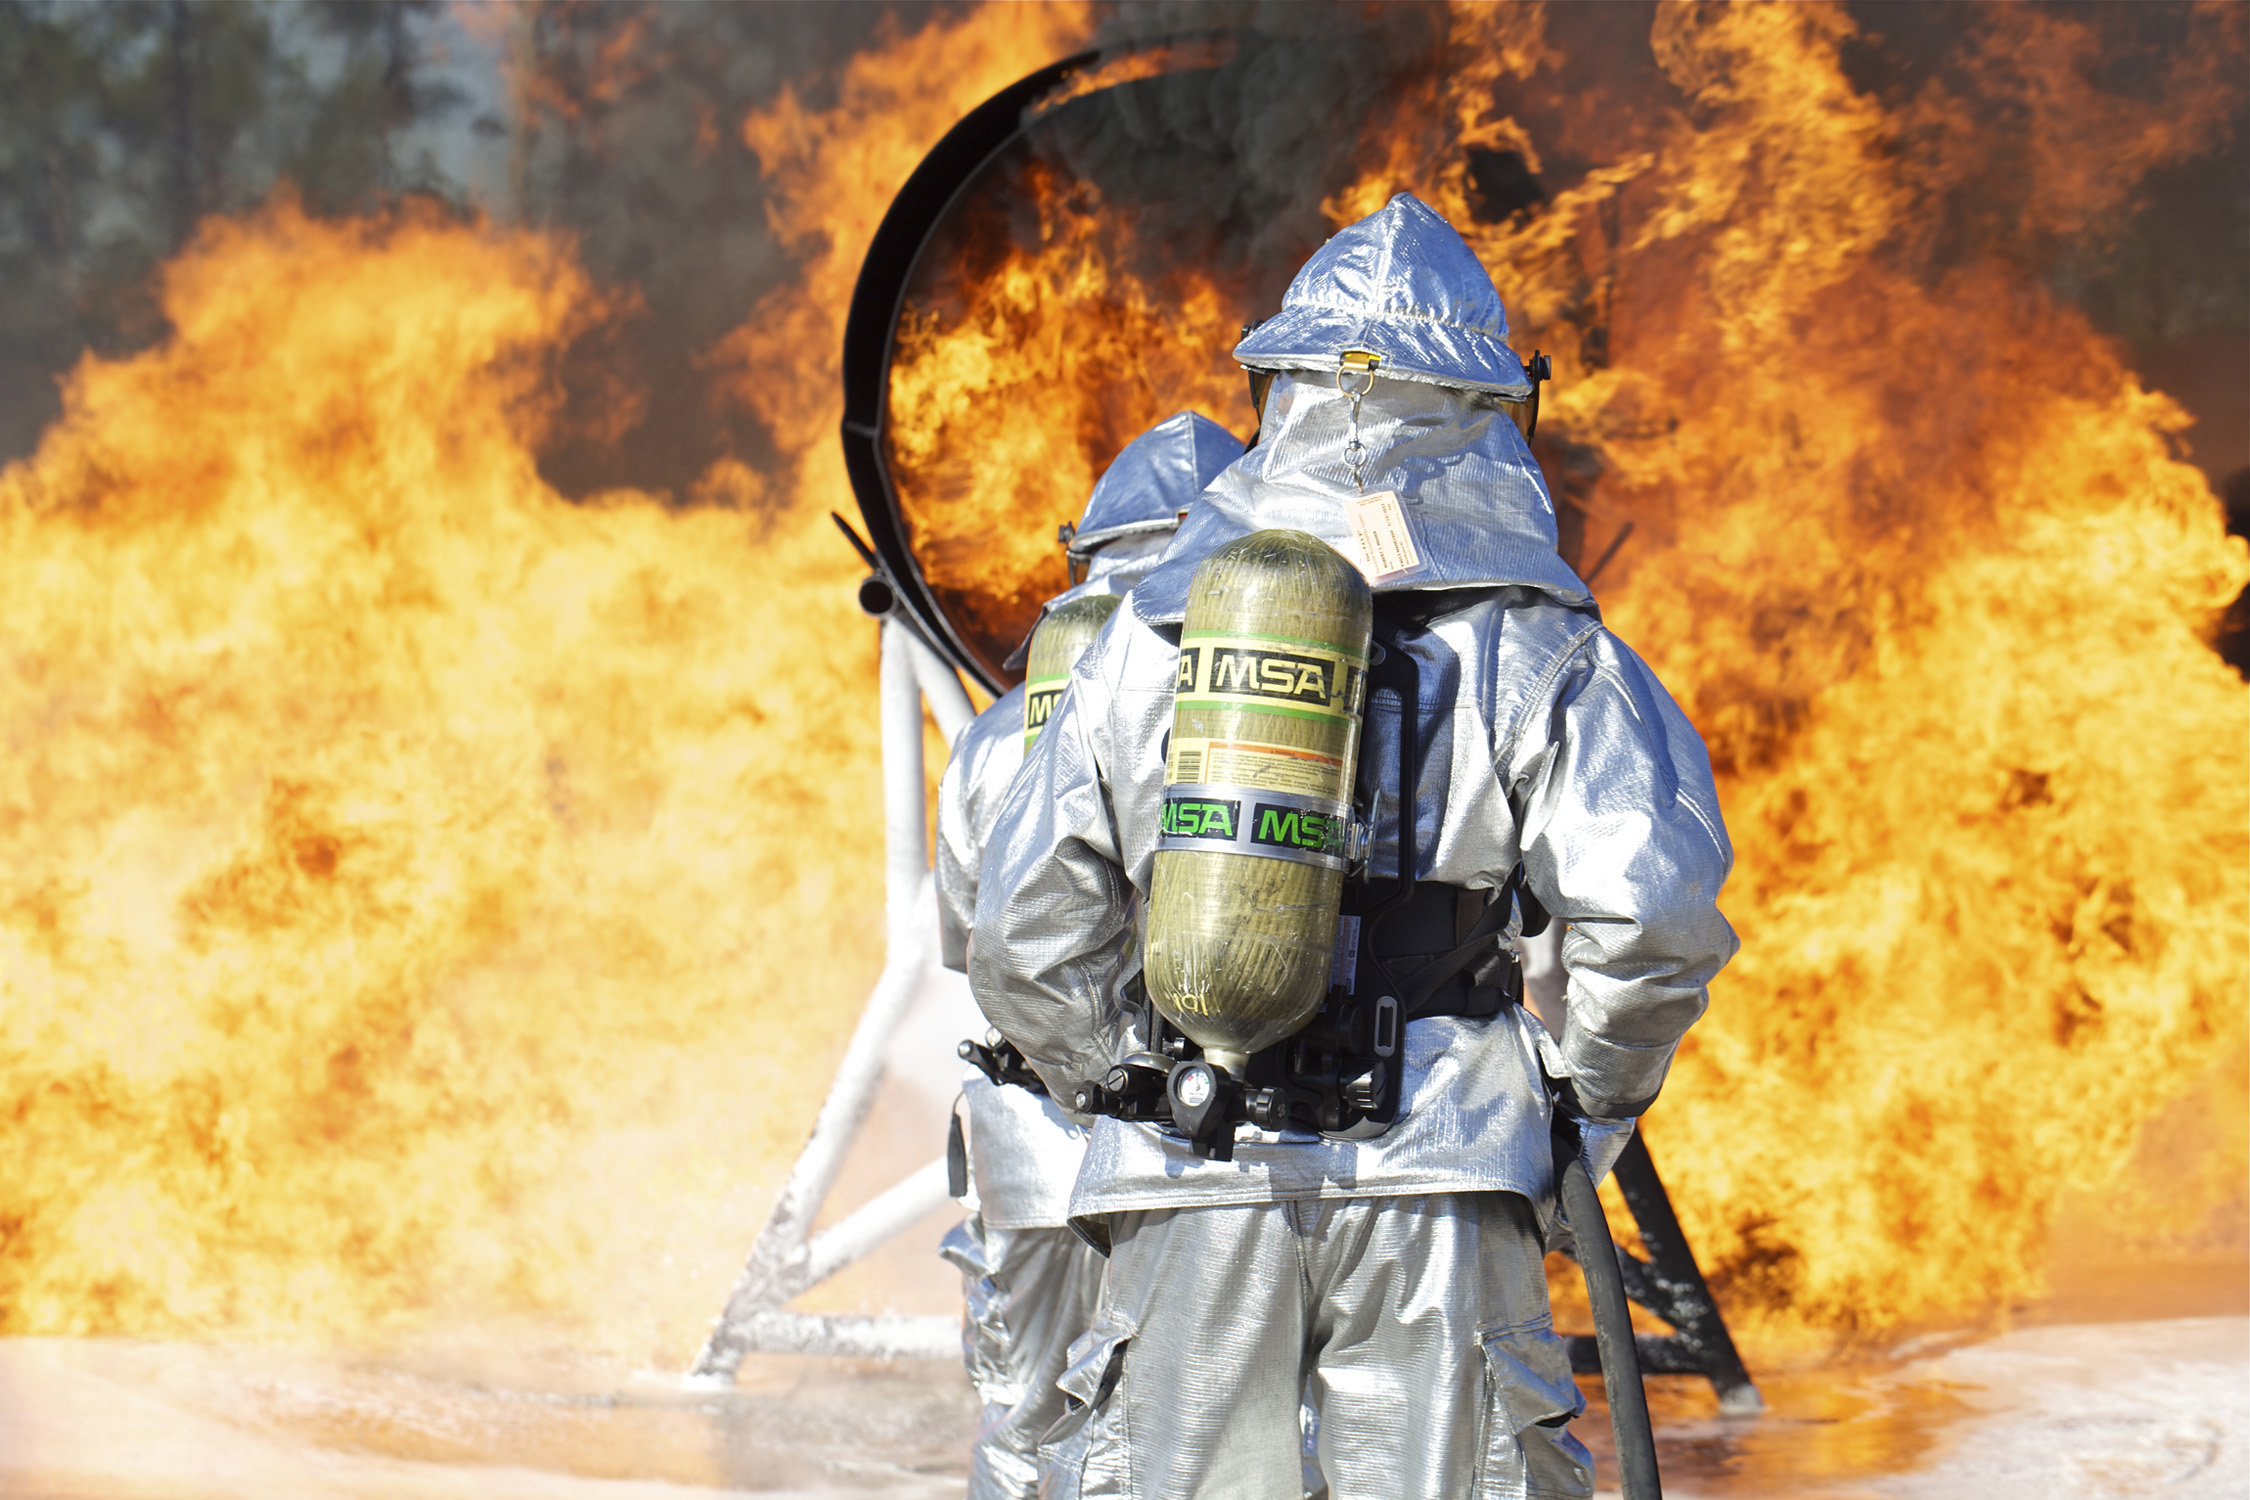 Dod Firefighter Certification Program Turns 20 Us Air Force